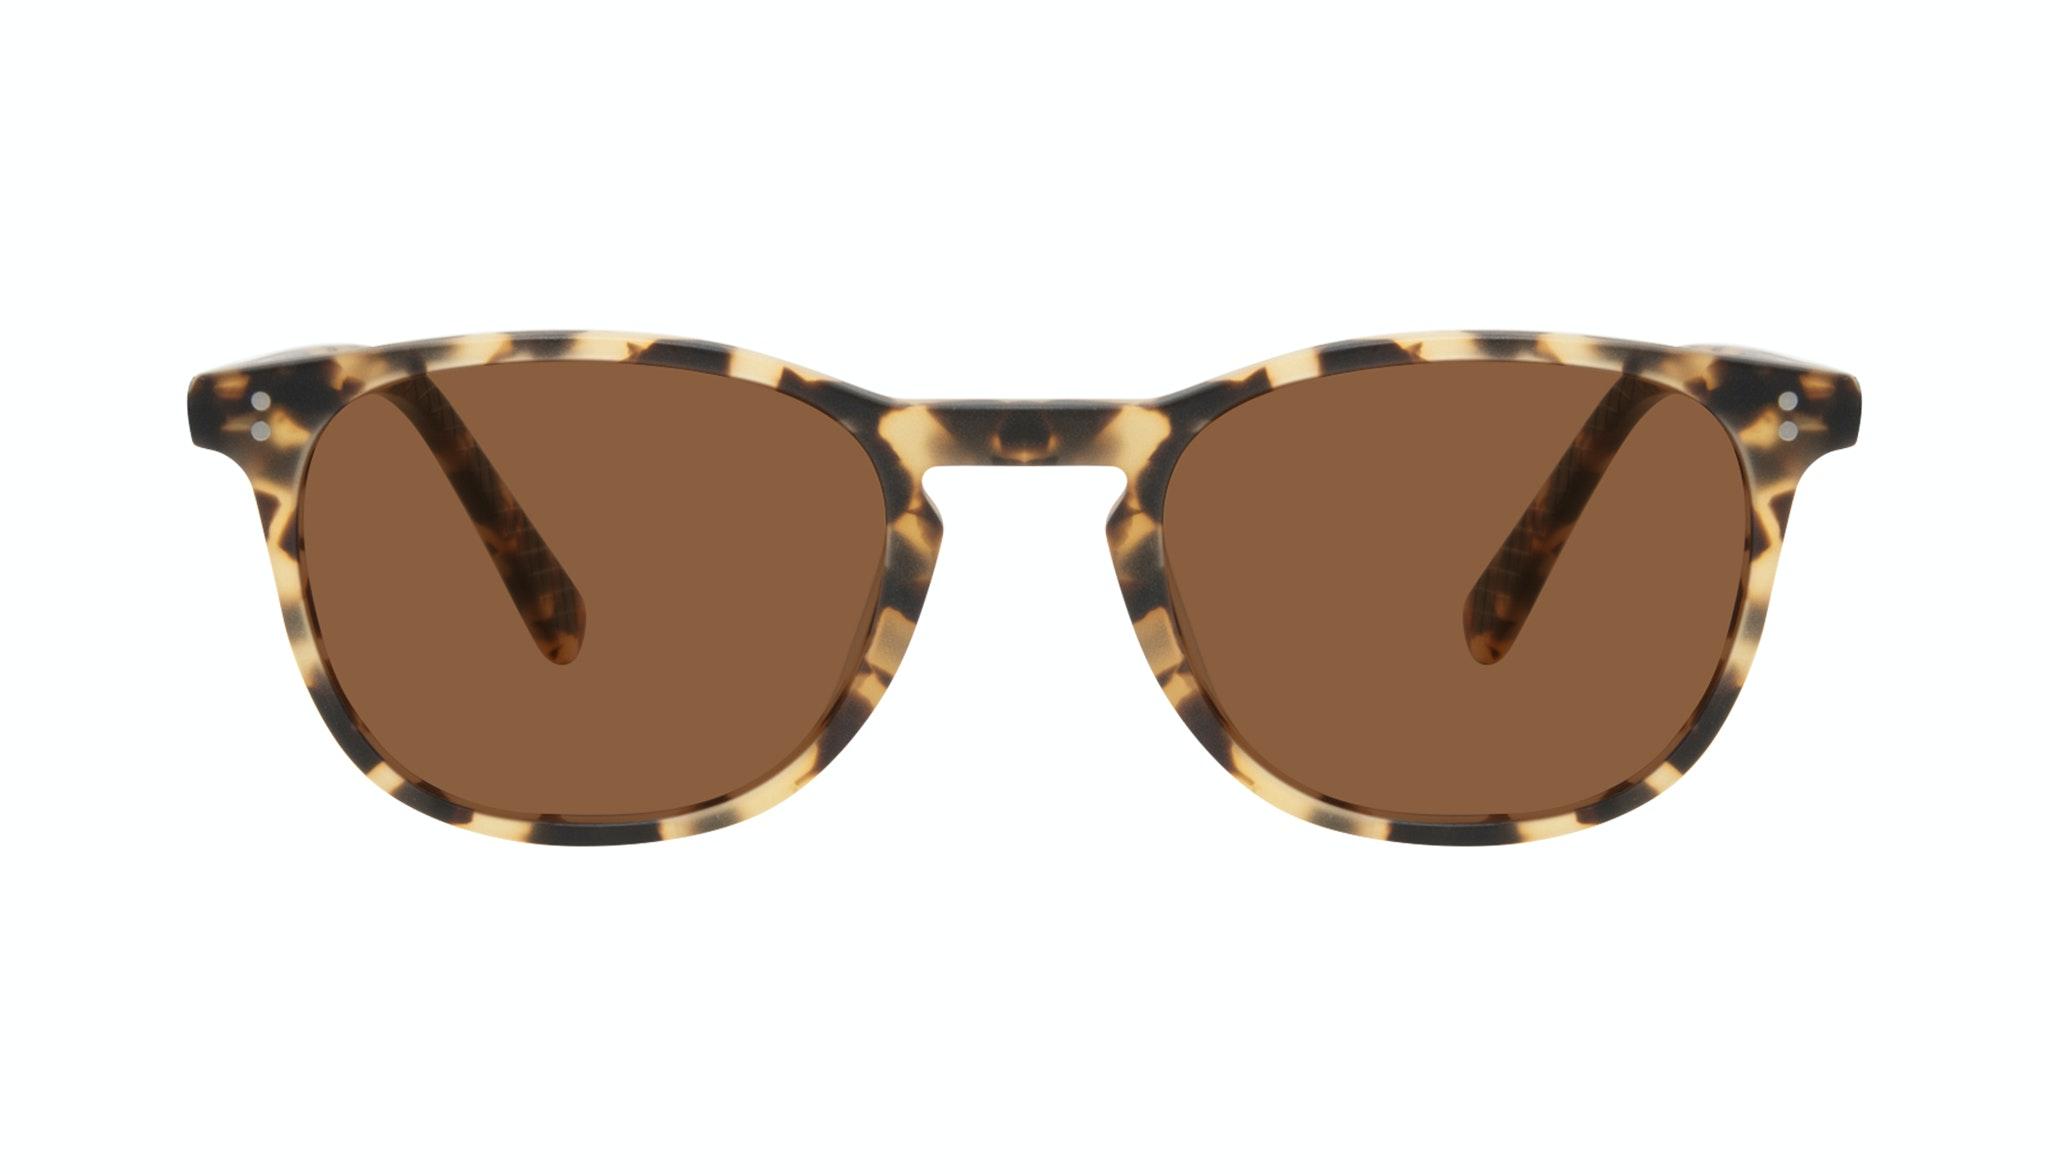 Affordable Fashion Glasses Round Sunglasses Men Trooper Tortoise Matte